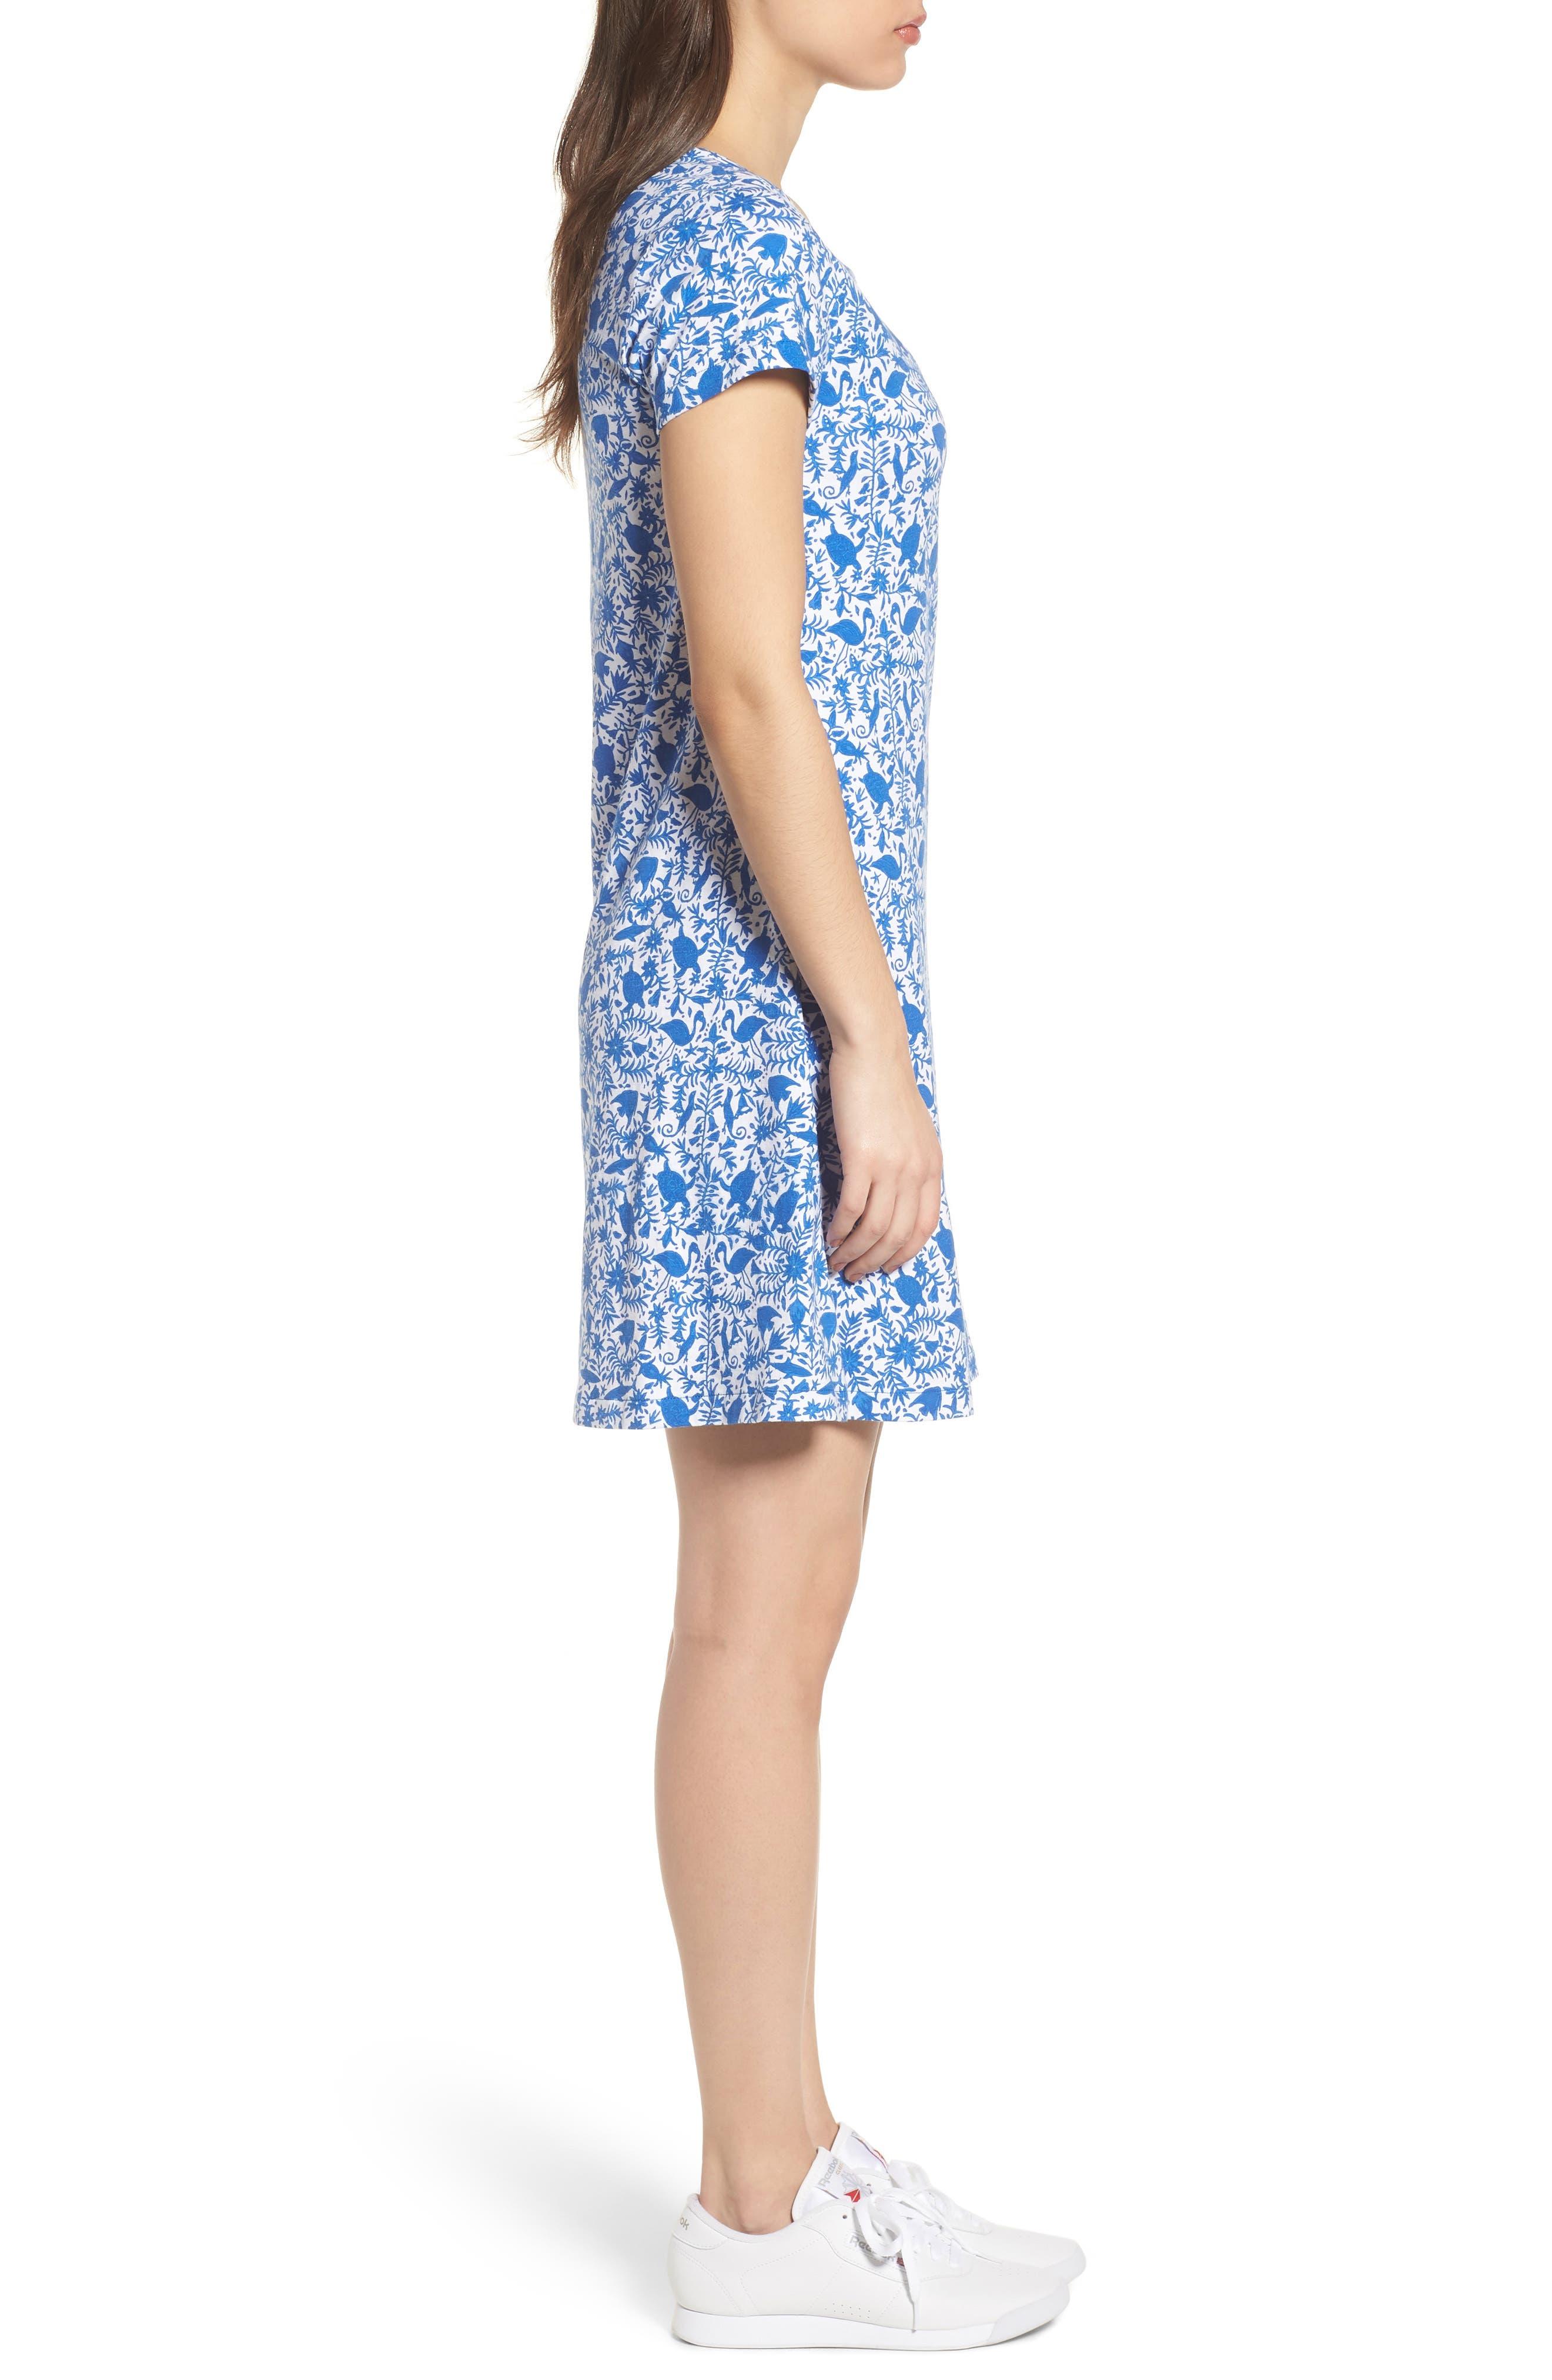 Bahamas Otomi Print Stretch Cotton Dress,                             Alternate thumbnail 3, color,                             413